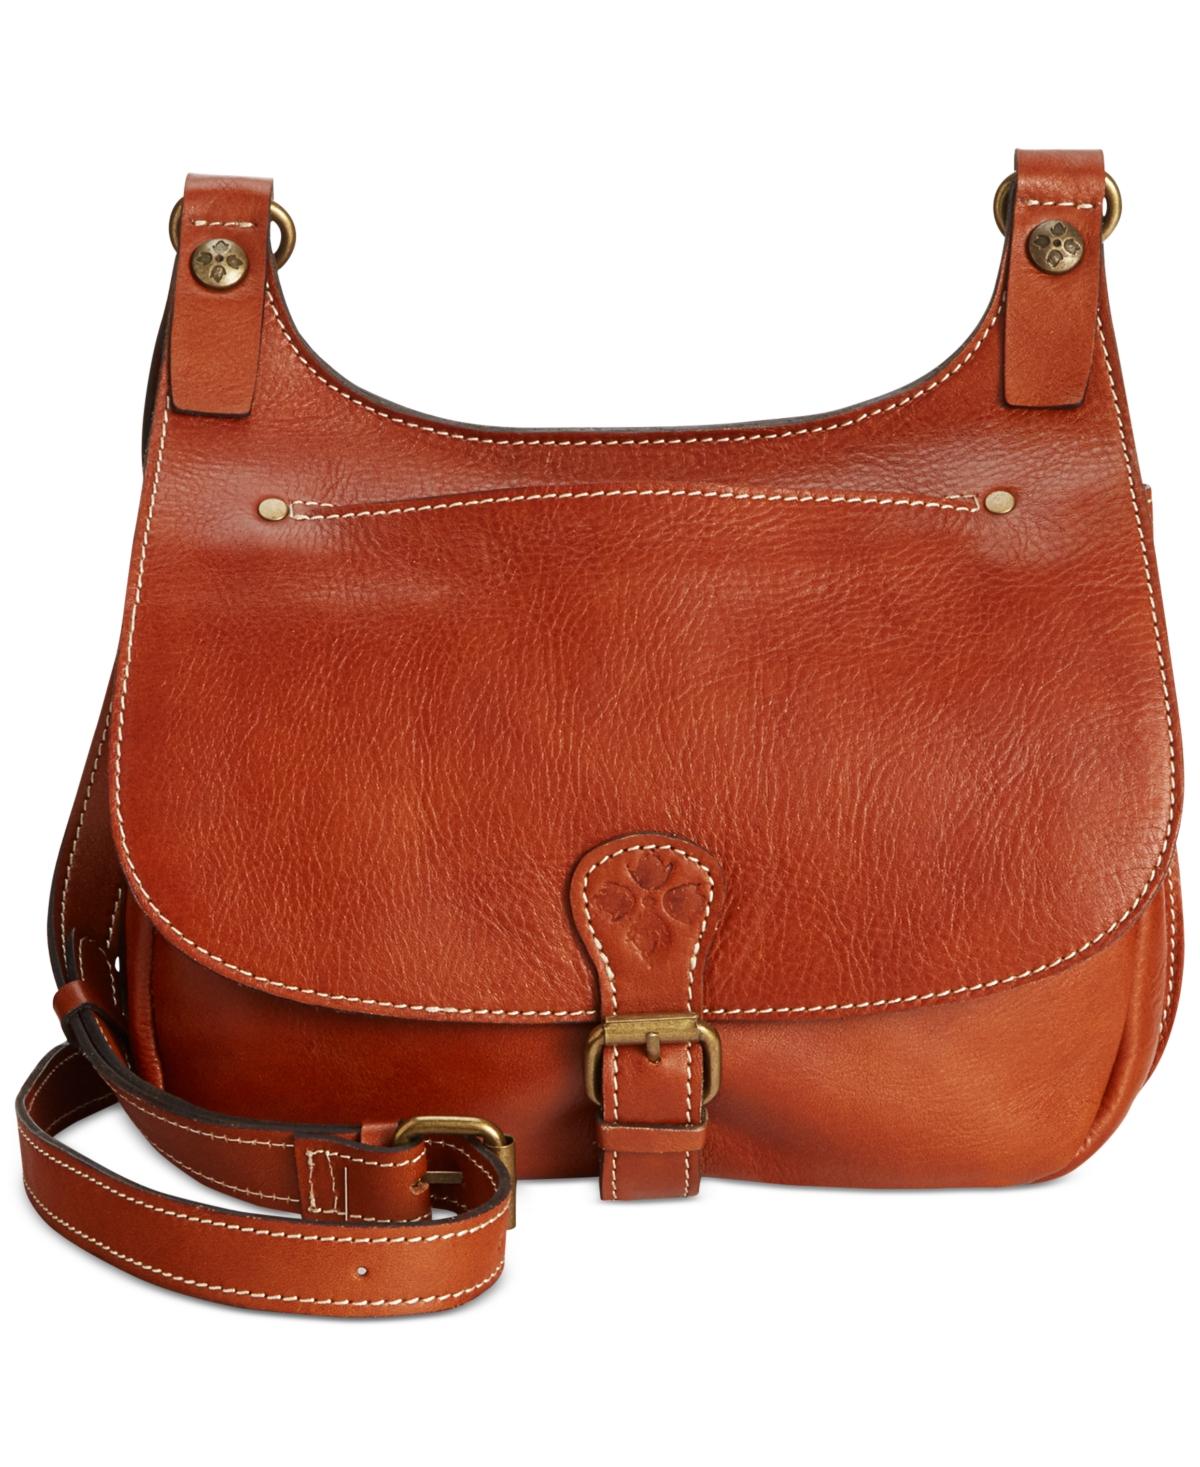 Patricia Nash London Smooth Leather Saddle Bag